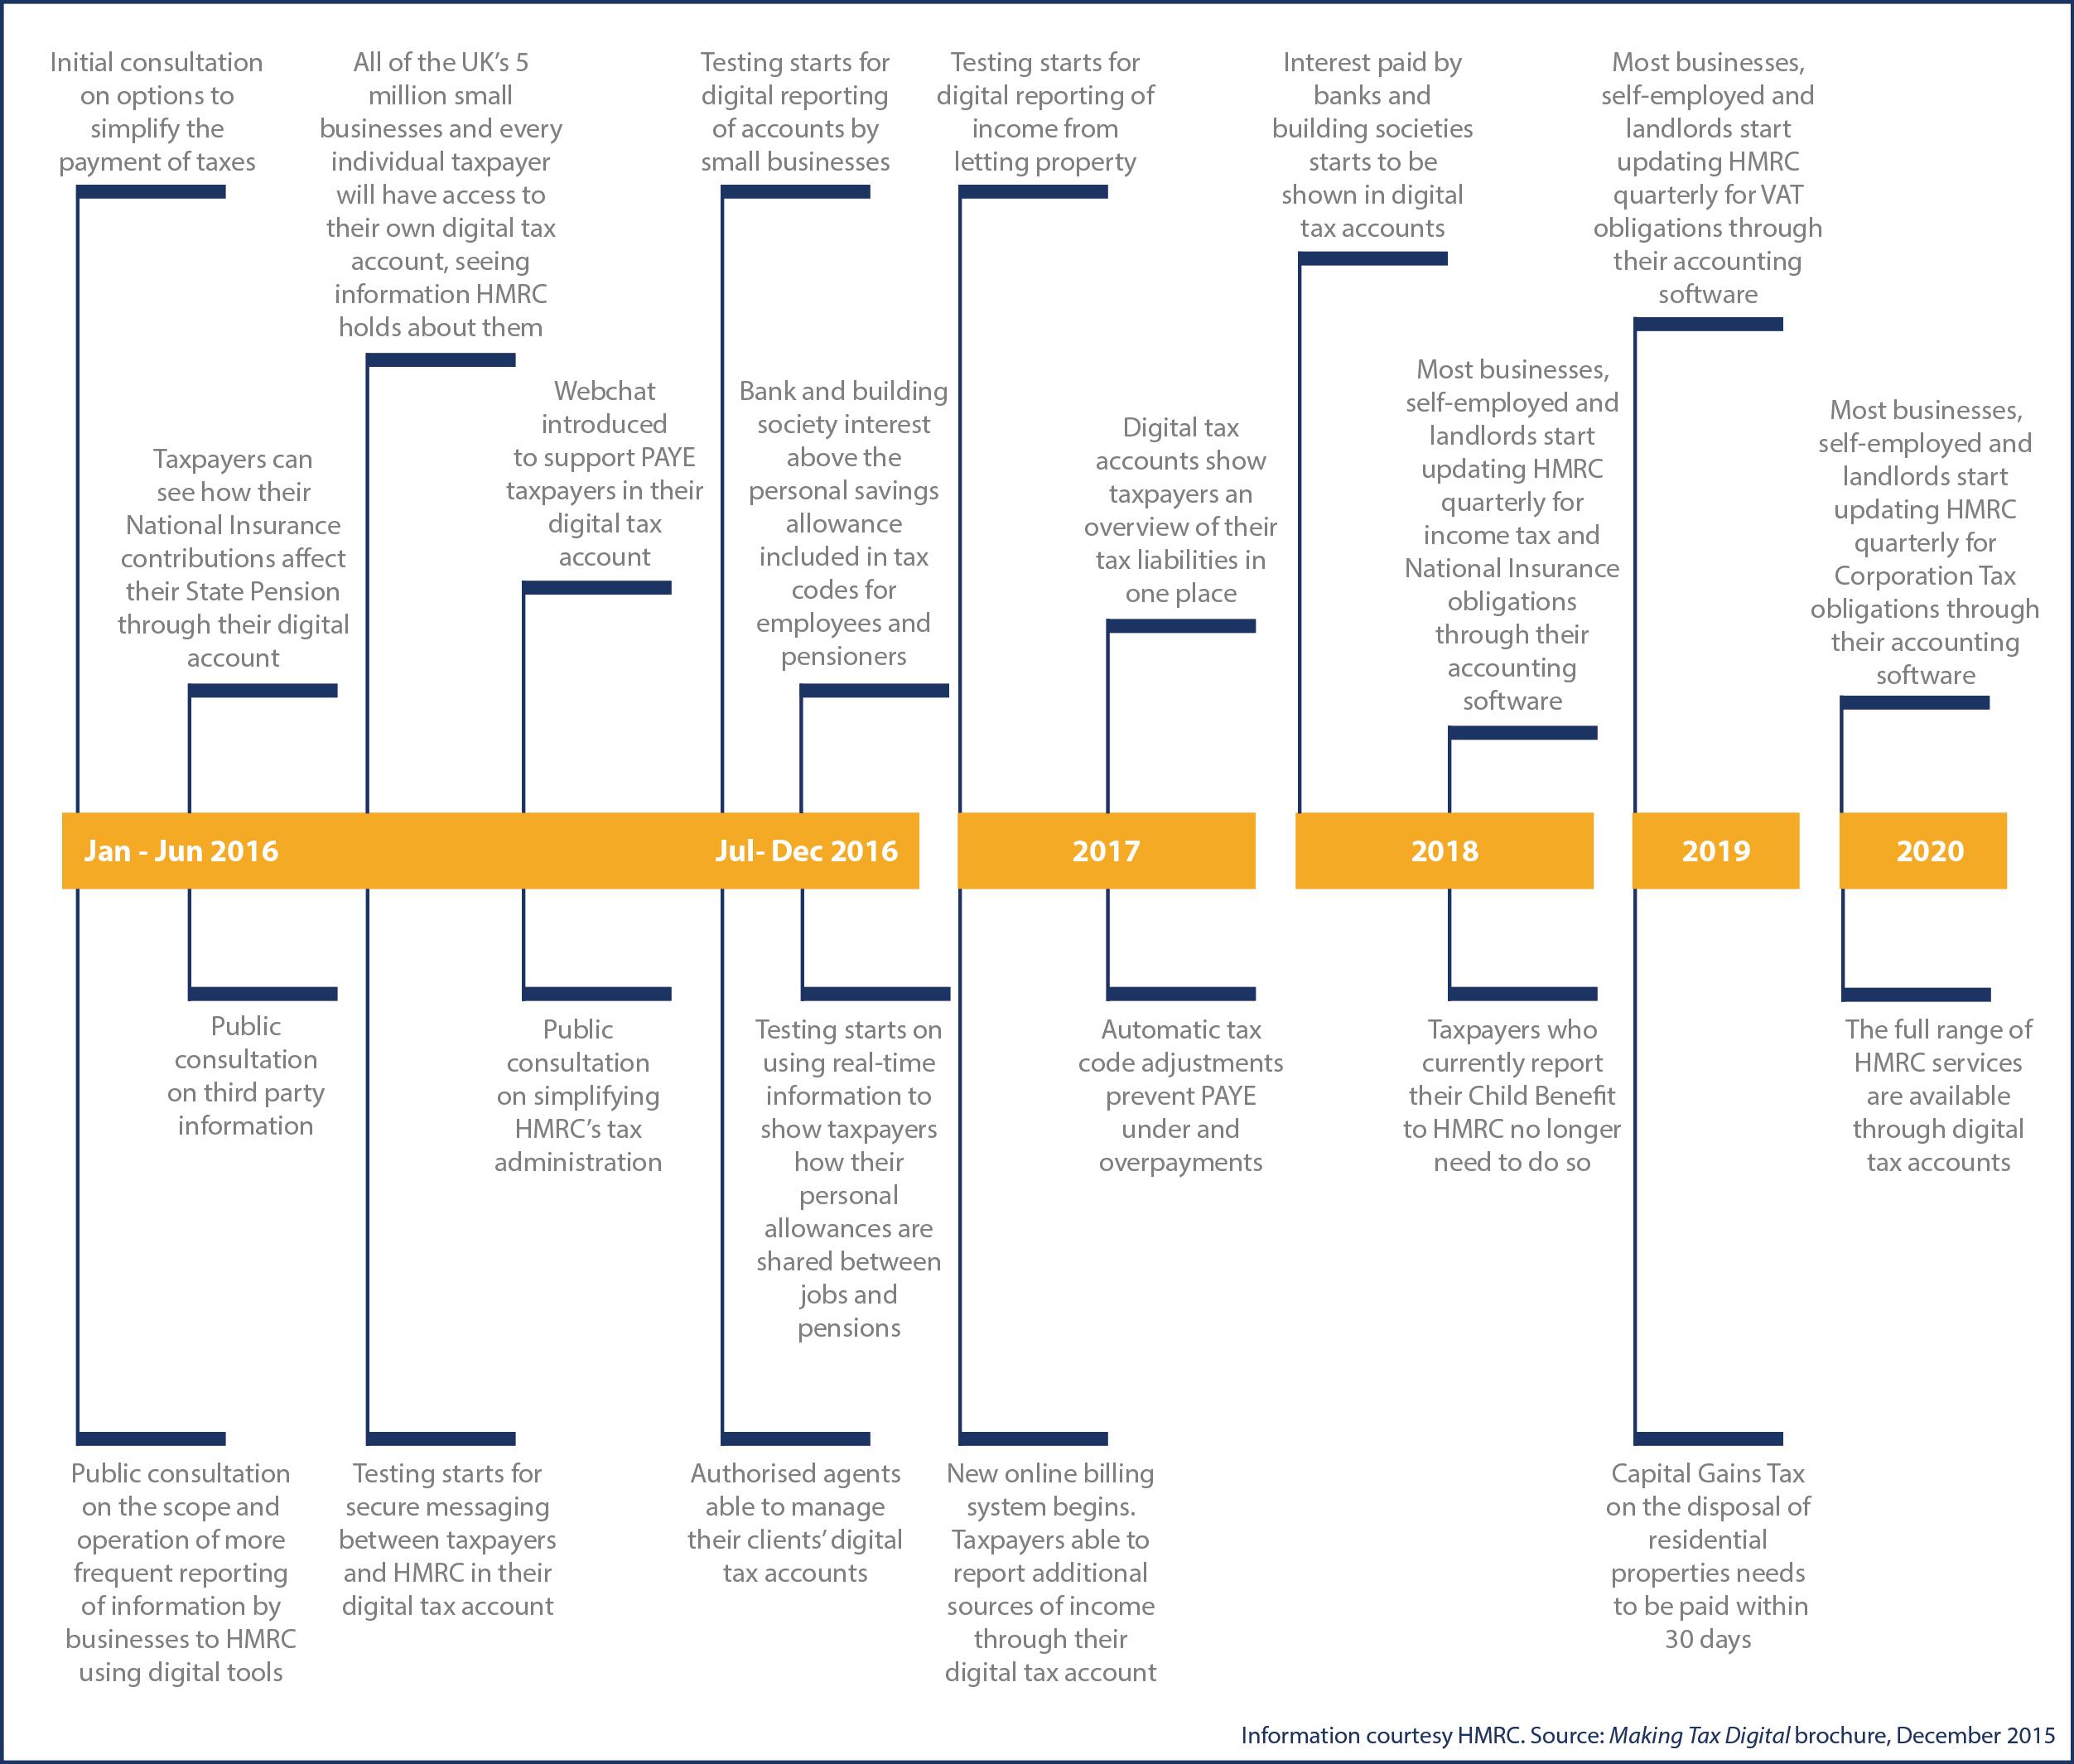 Digiital Tax Accounts Timeline